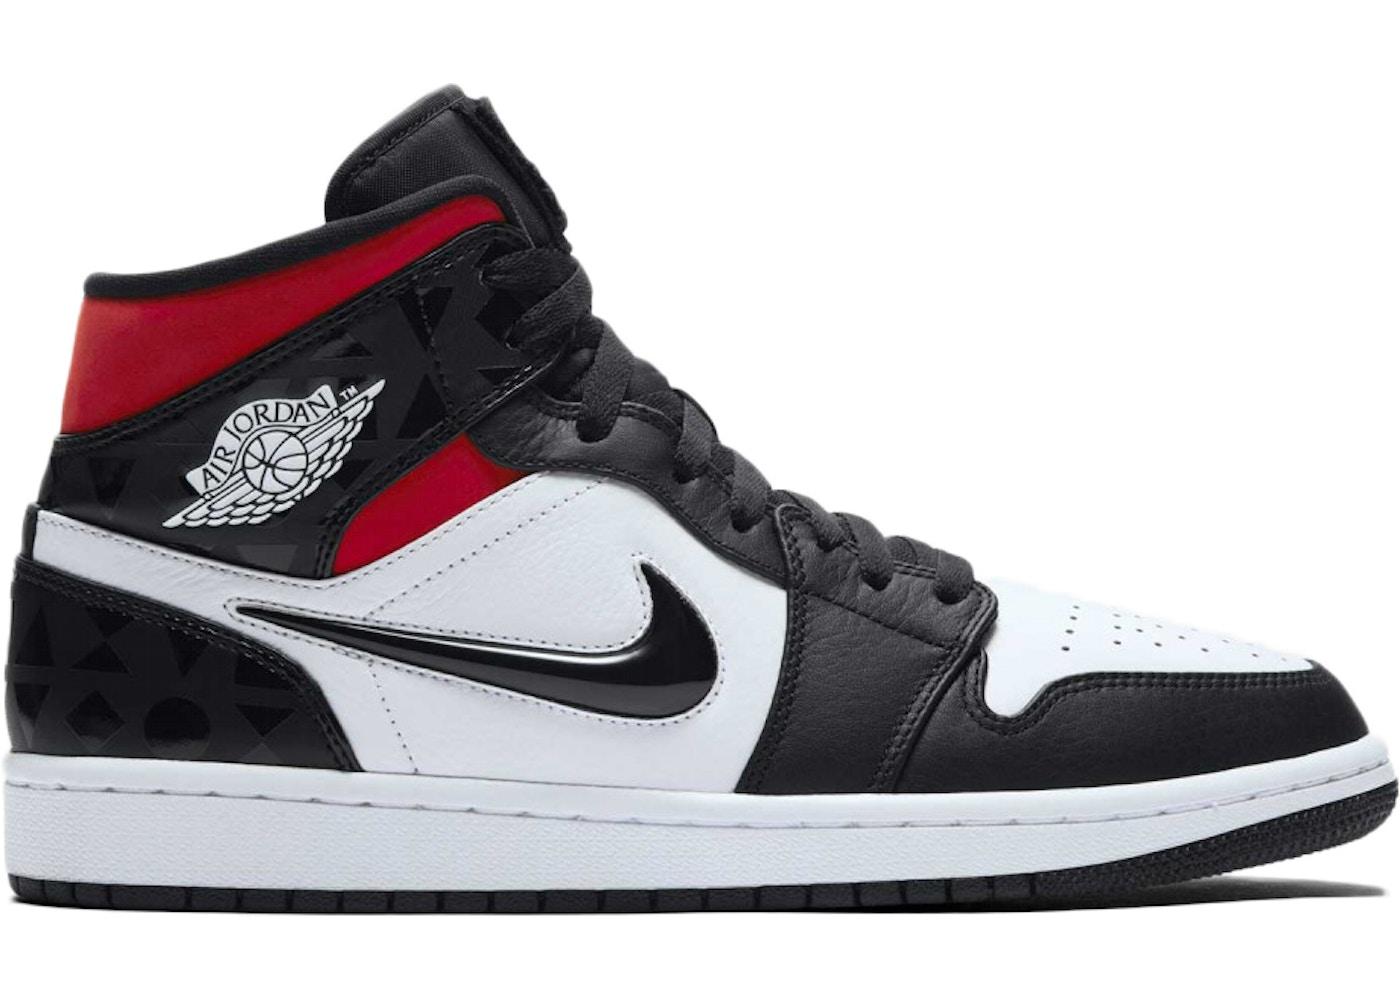 online retailer 4052d 2d0dd Air Jordan 1 Size 7 Shoes - Release Date